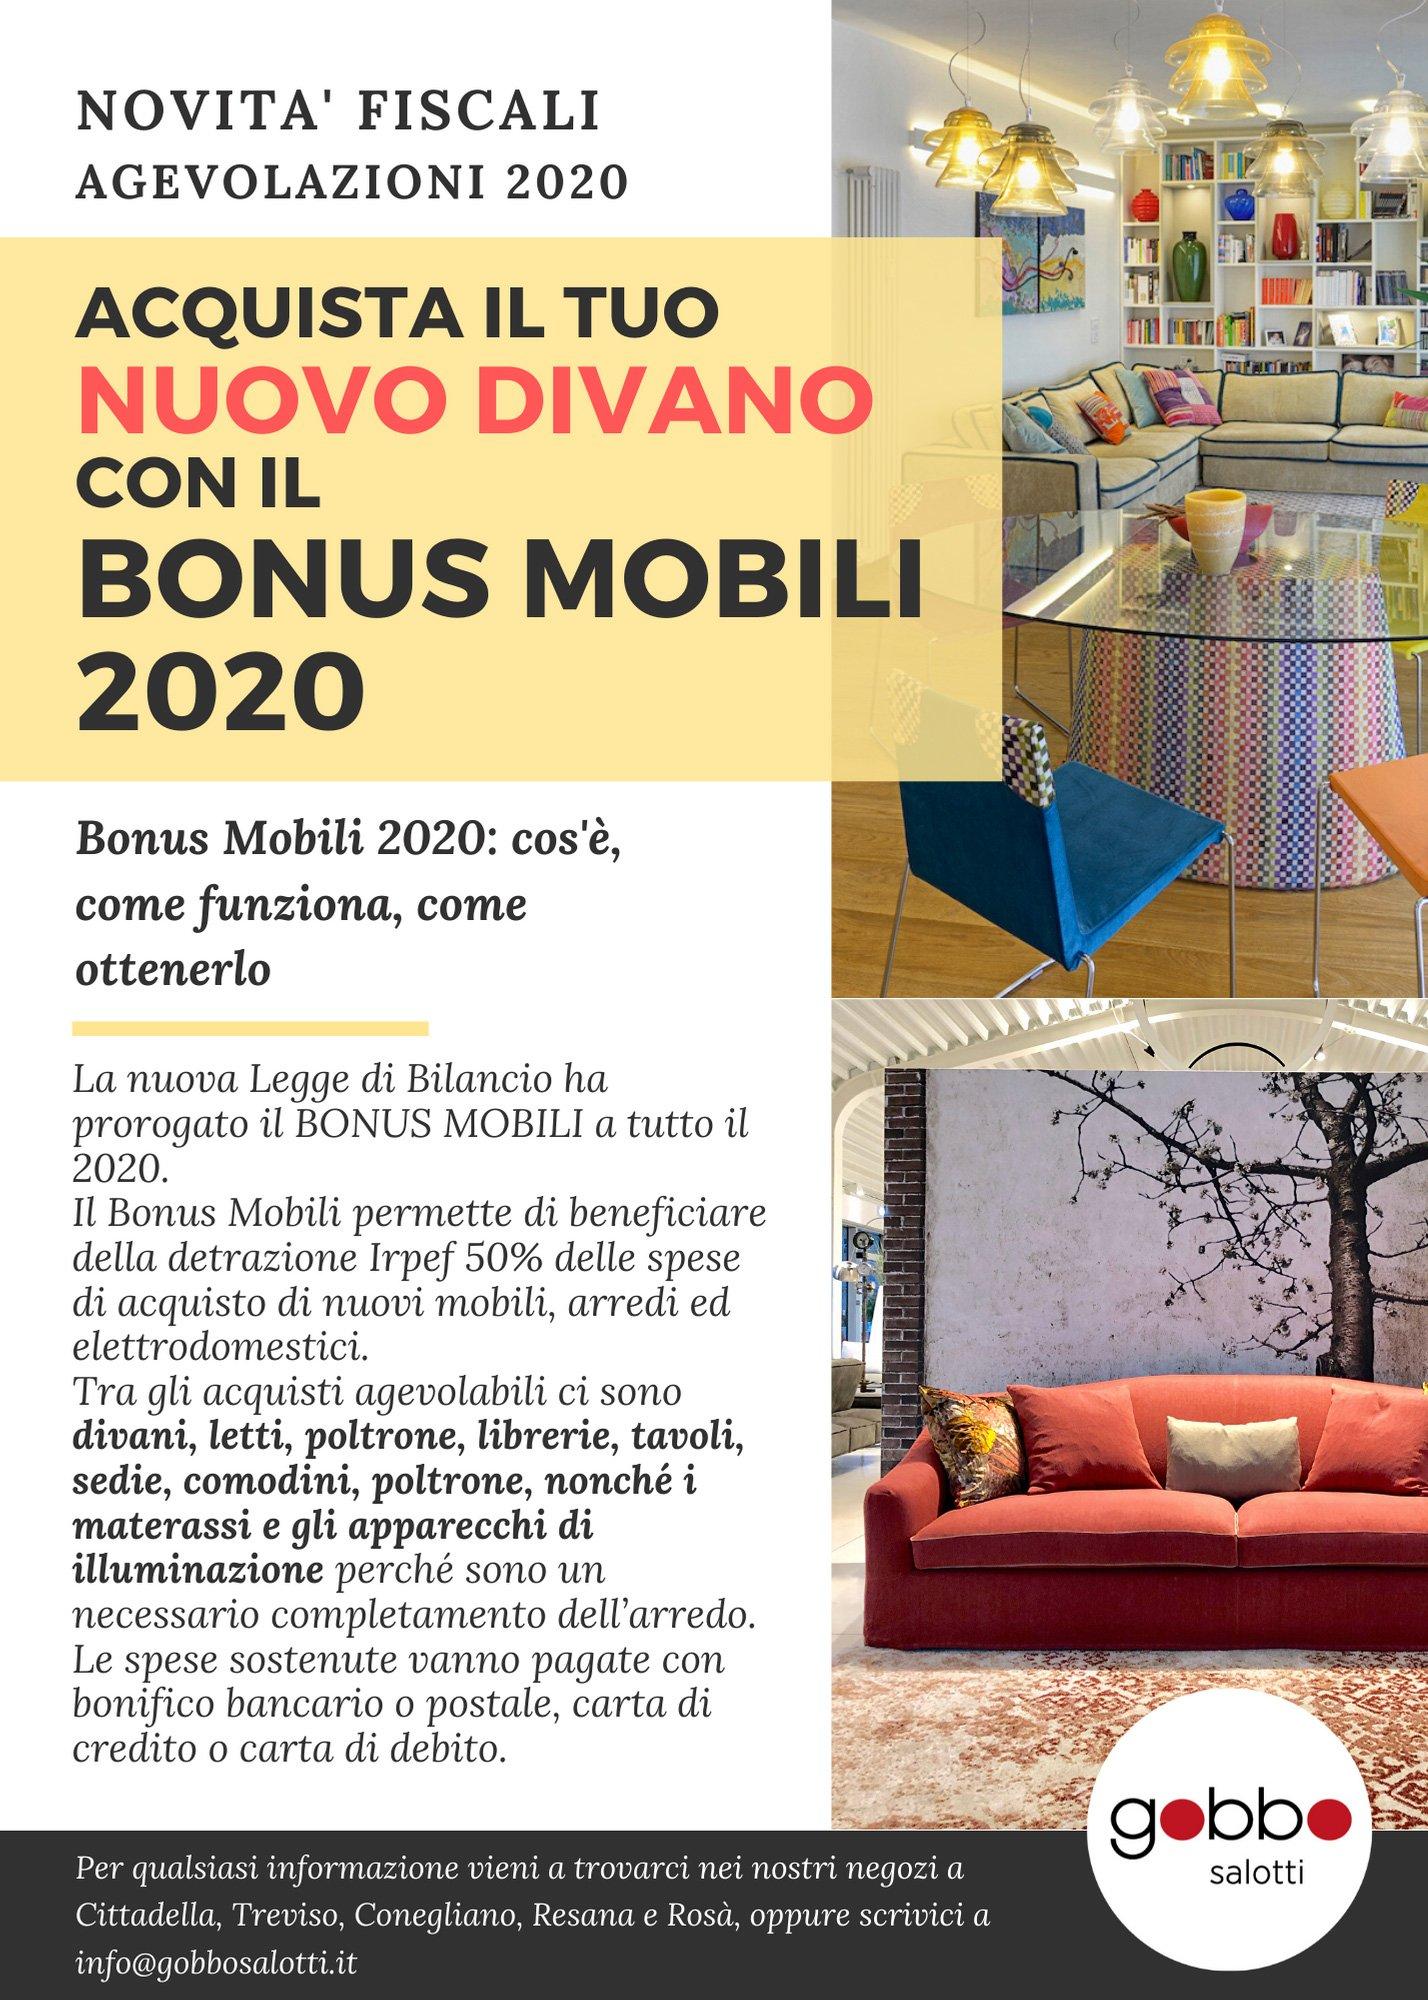 Gobbo Salotti BONUS MOBILI 2020 Detrazioni fiscali bonus casa